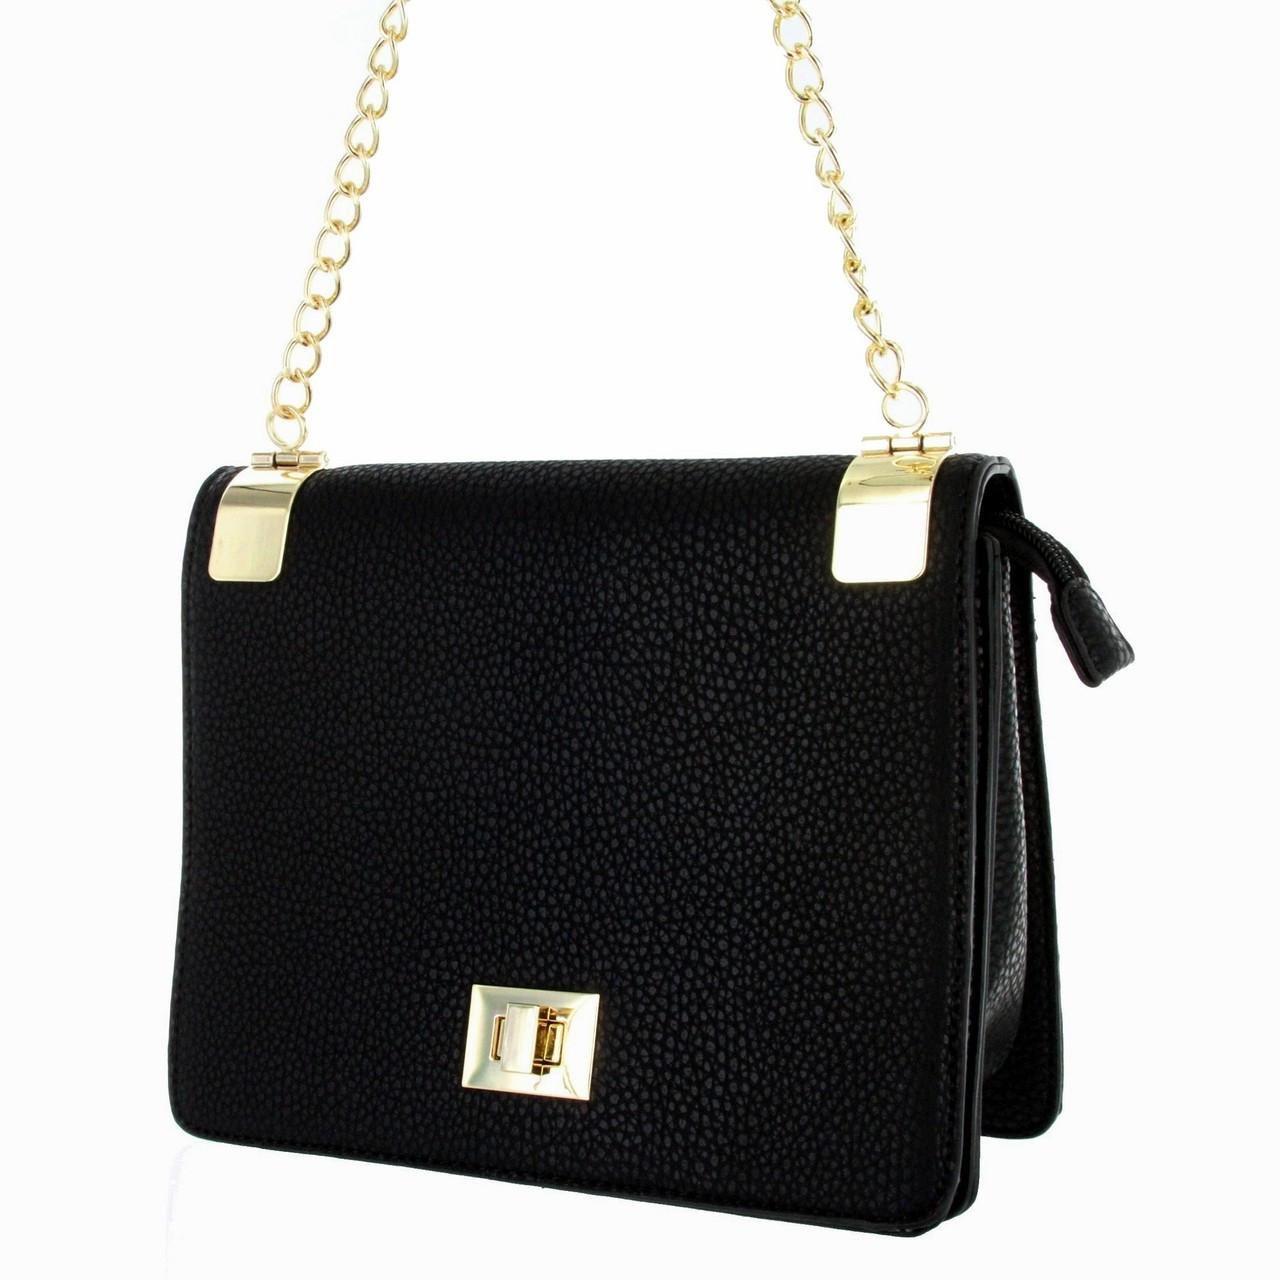 a00b924e8 Alyssa Women's Classic Faux Leather Designer Crossbody Shoulder Handbag  Purse